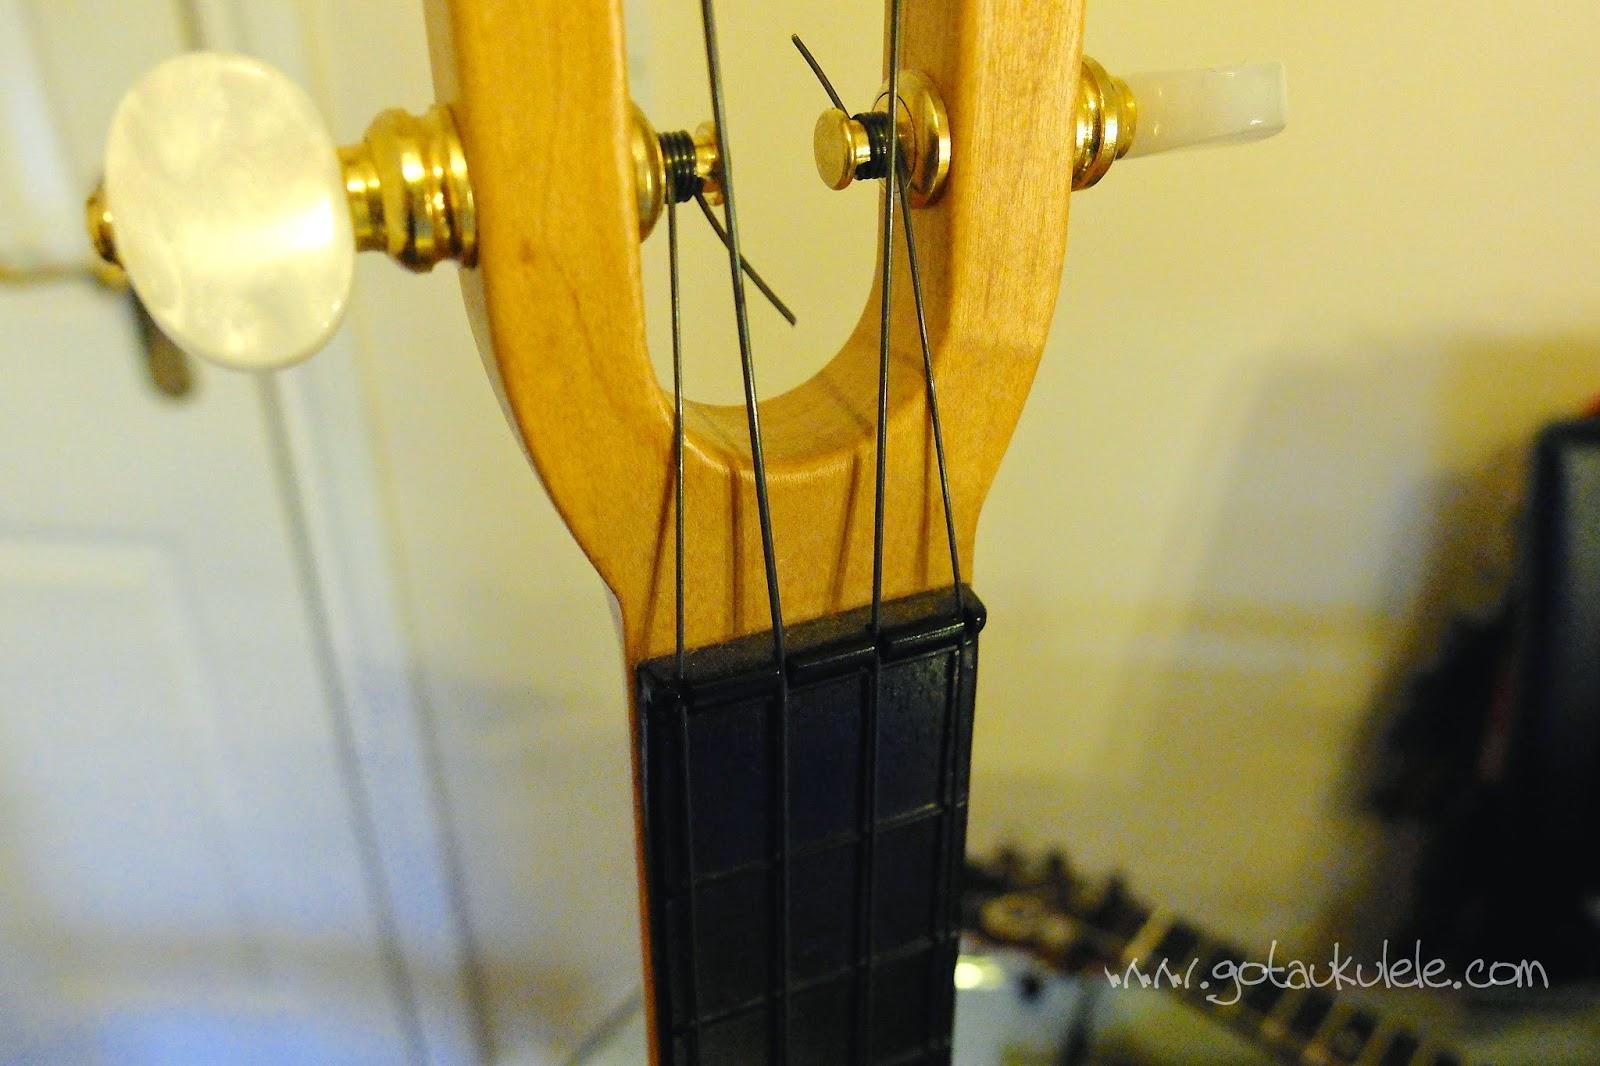 Aquila Lava Ukulele Strings Fluke headstock